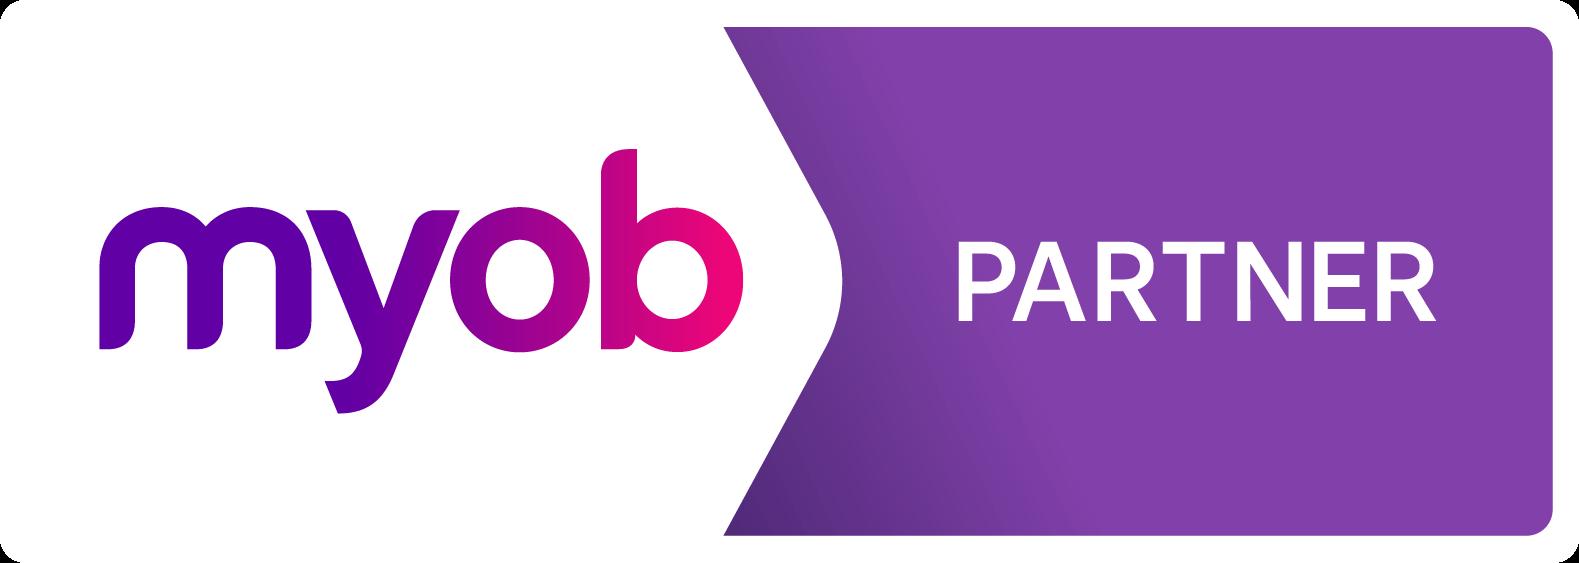 myob-partner-bookkeeping-accounting-software-admin-army-nz